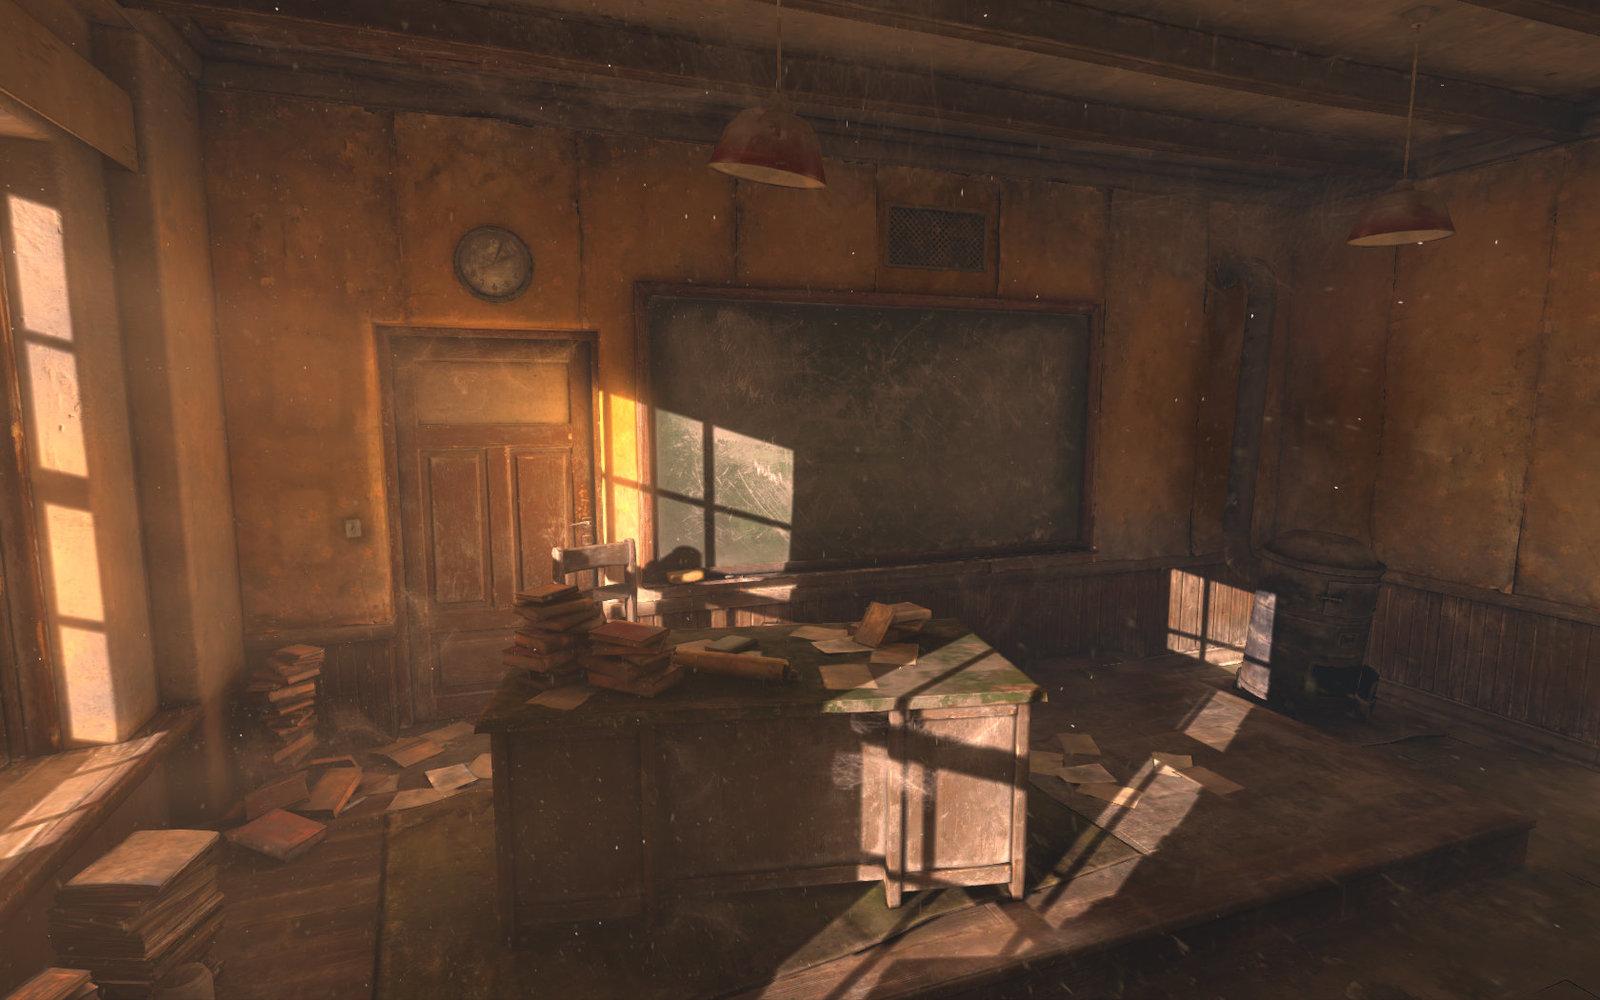 Abandoned Classroom (2015)